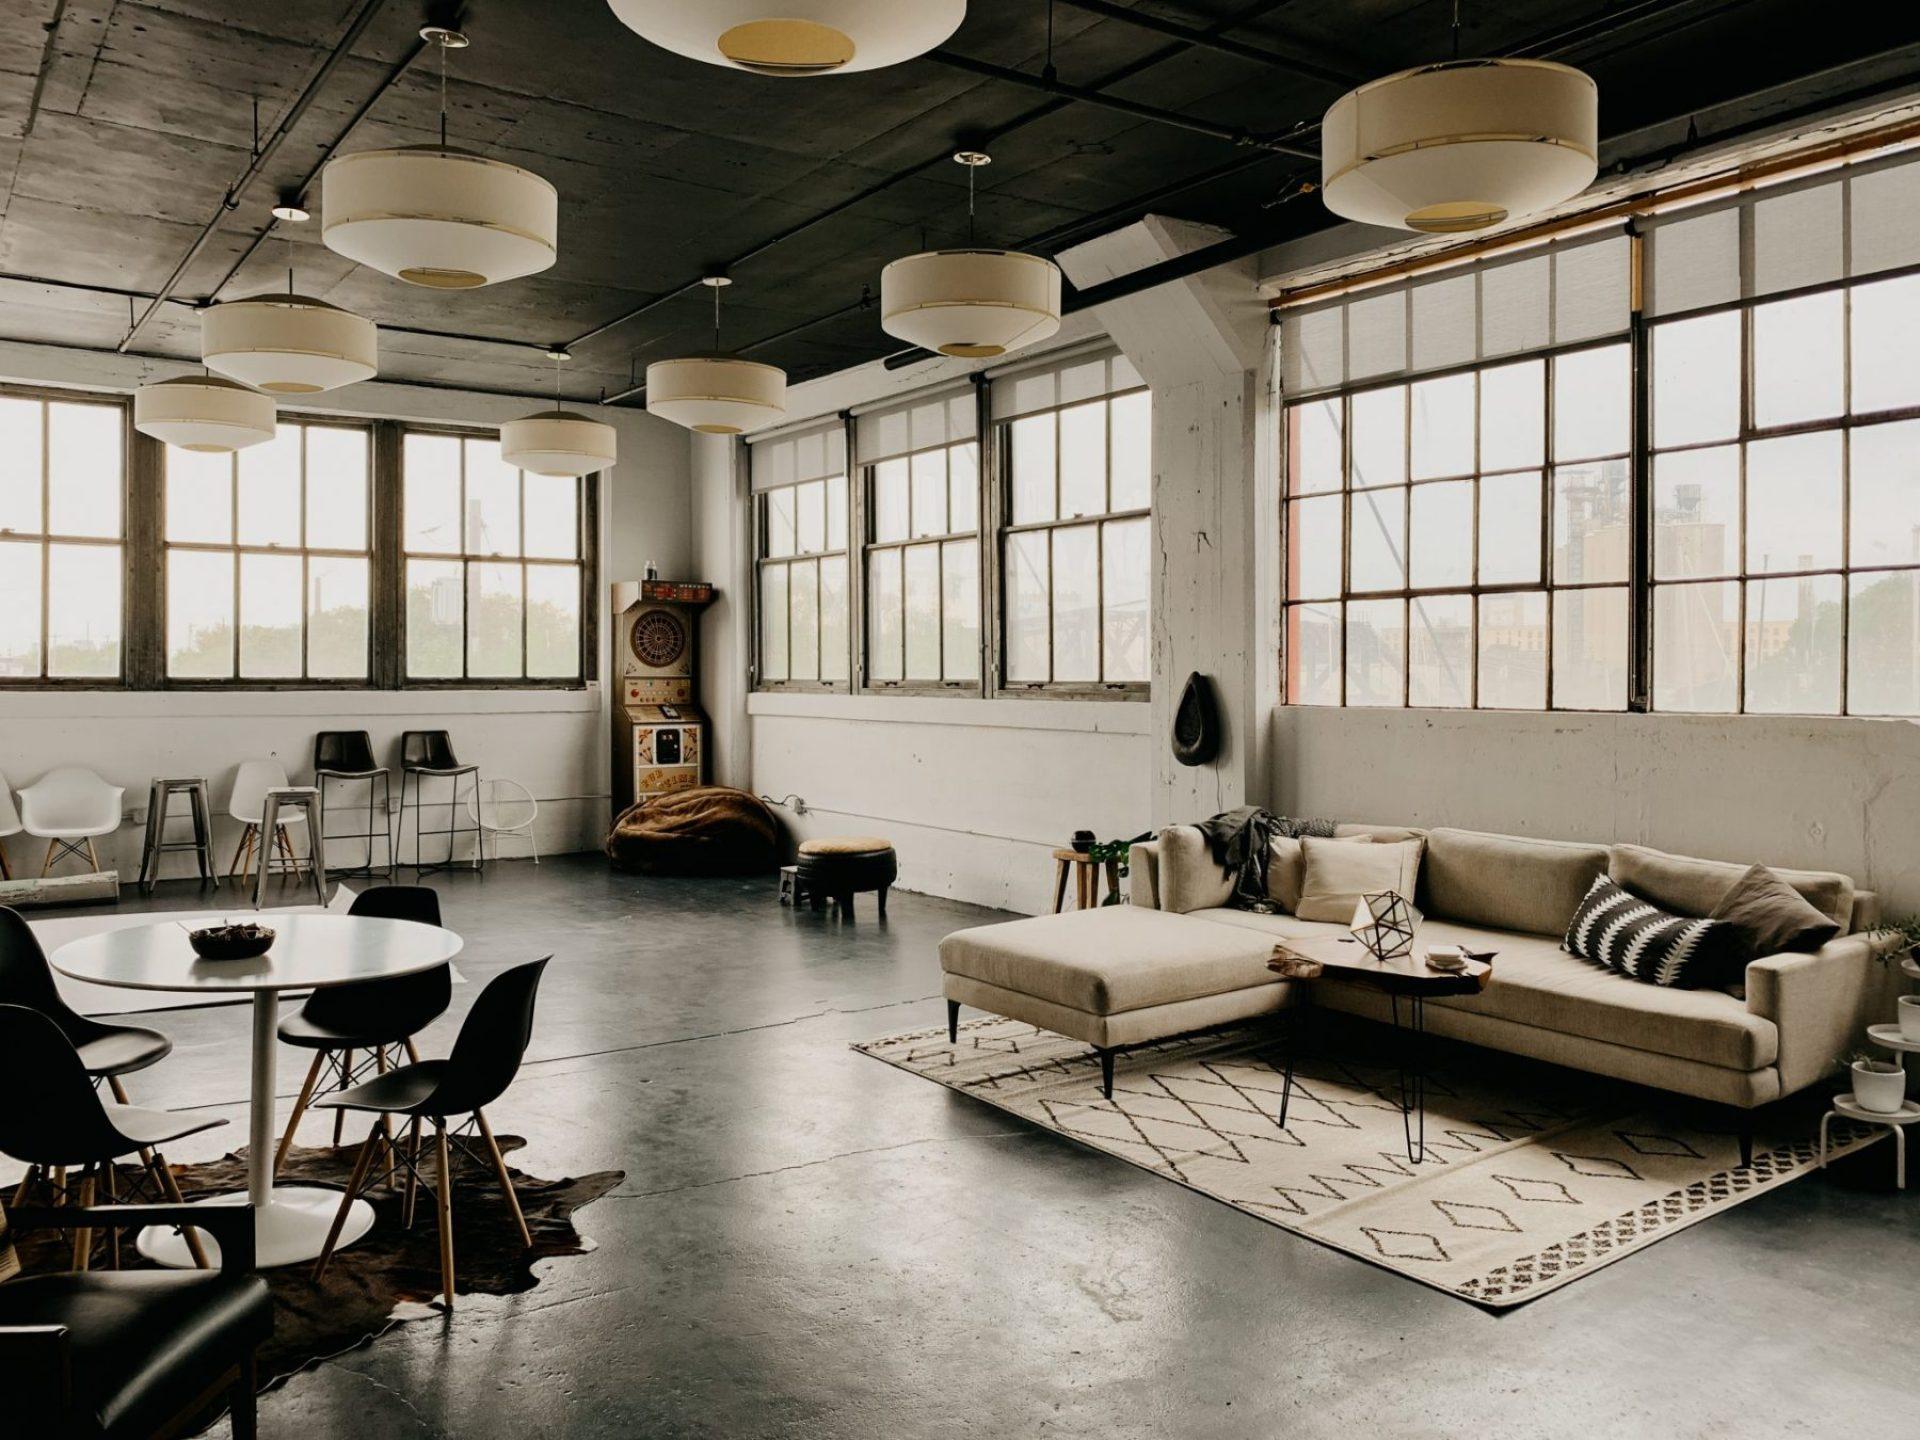 milwaukee photography studio for rent